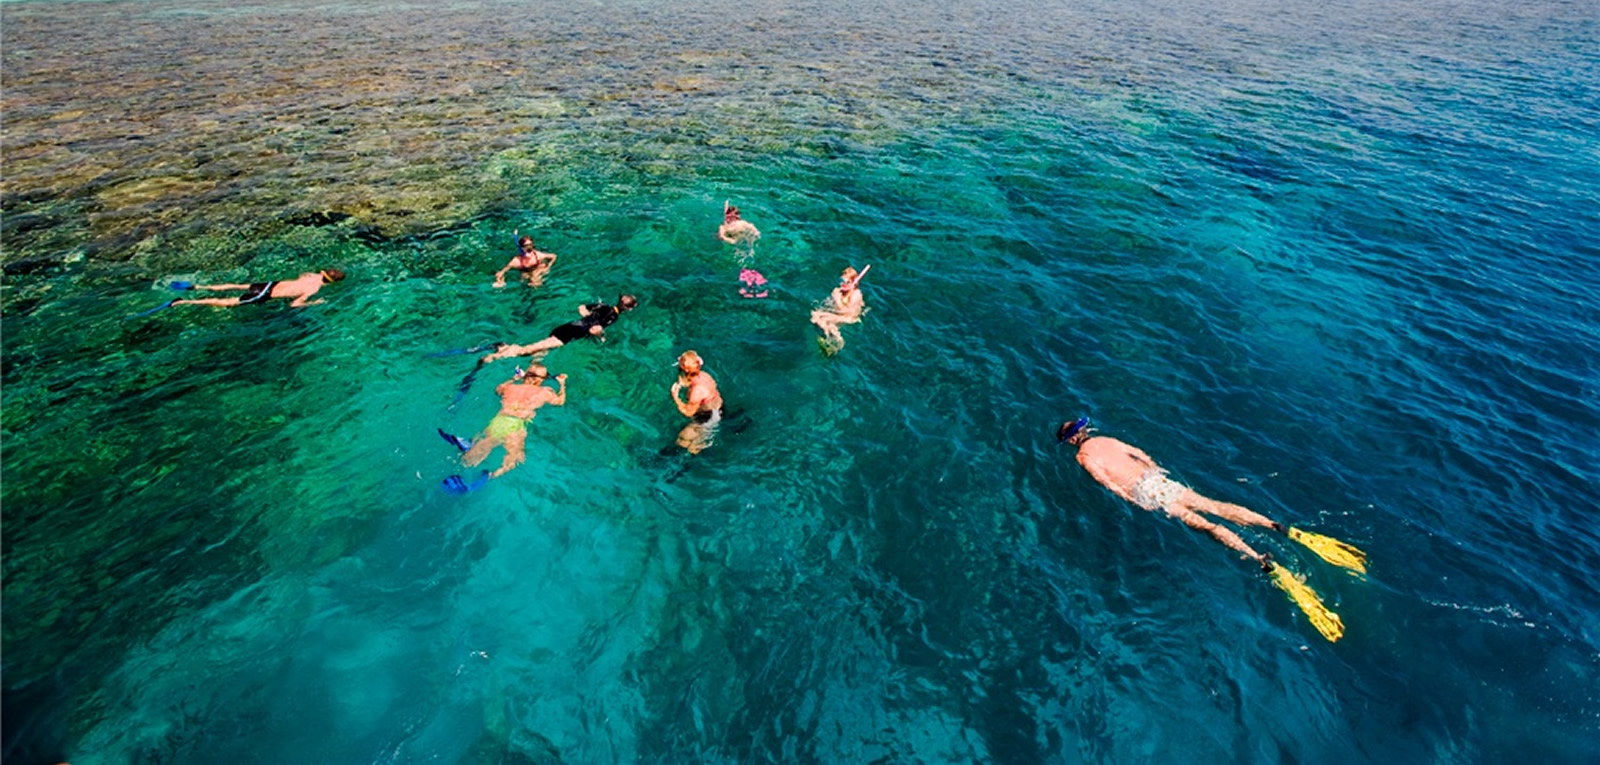 Best Snorkeling Beach In Maldives